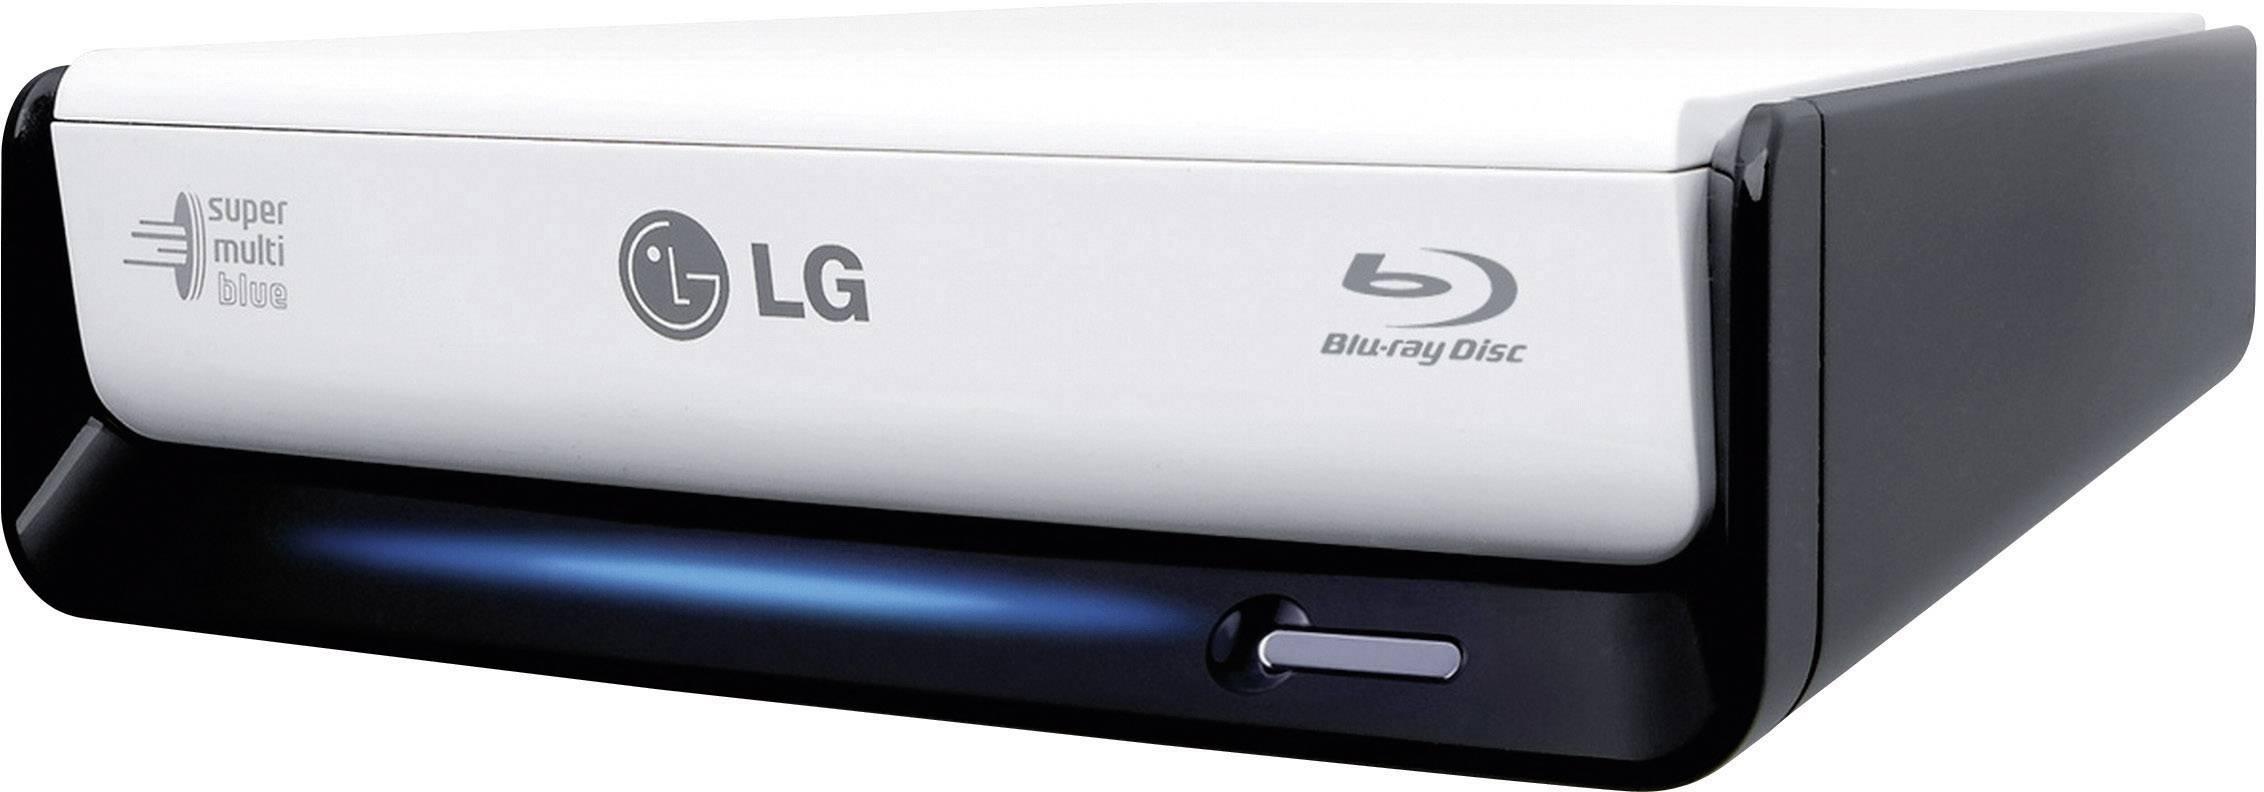 LG BE12LU30 Blu-ray Drive Driver (2019)